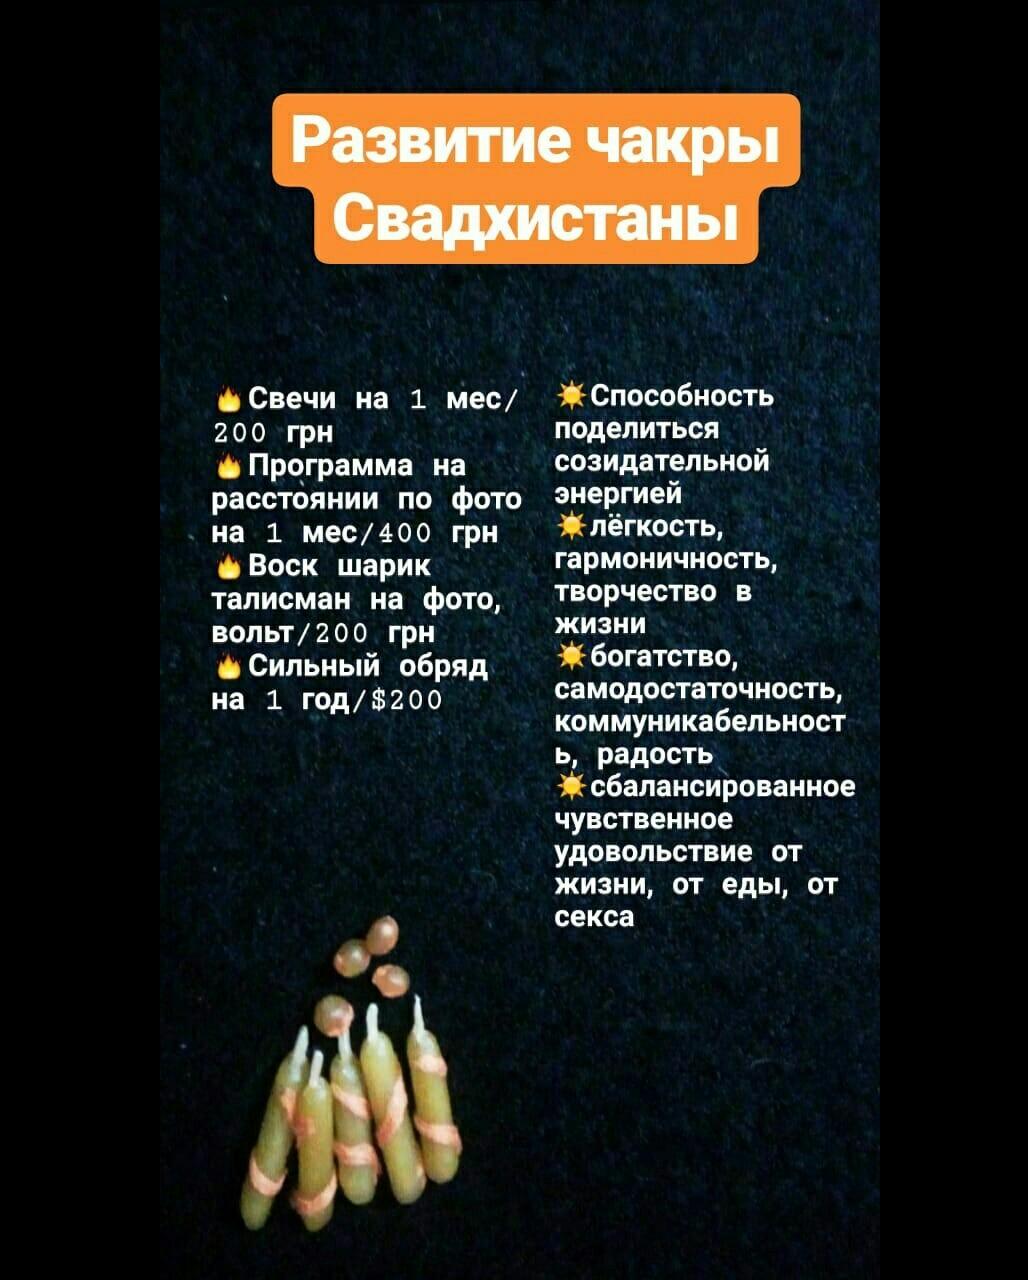 Хештег анахата на   Салон Магии и мистики Елены Руденко ( Валтеи ). Киев ,тел: 0506251562  CFh5hY8nNe0